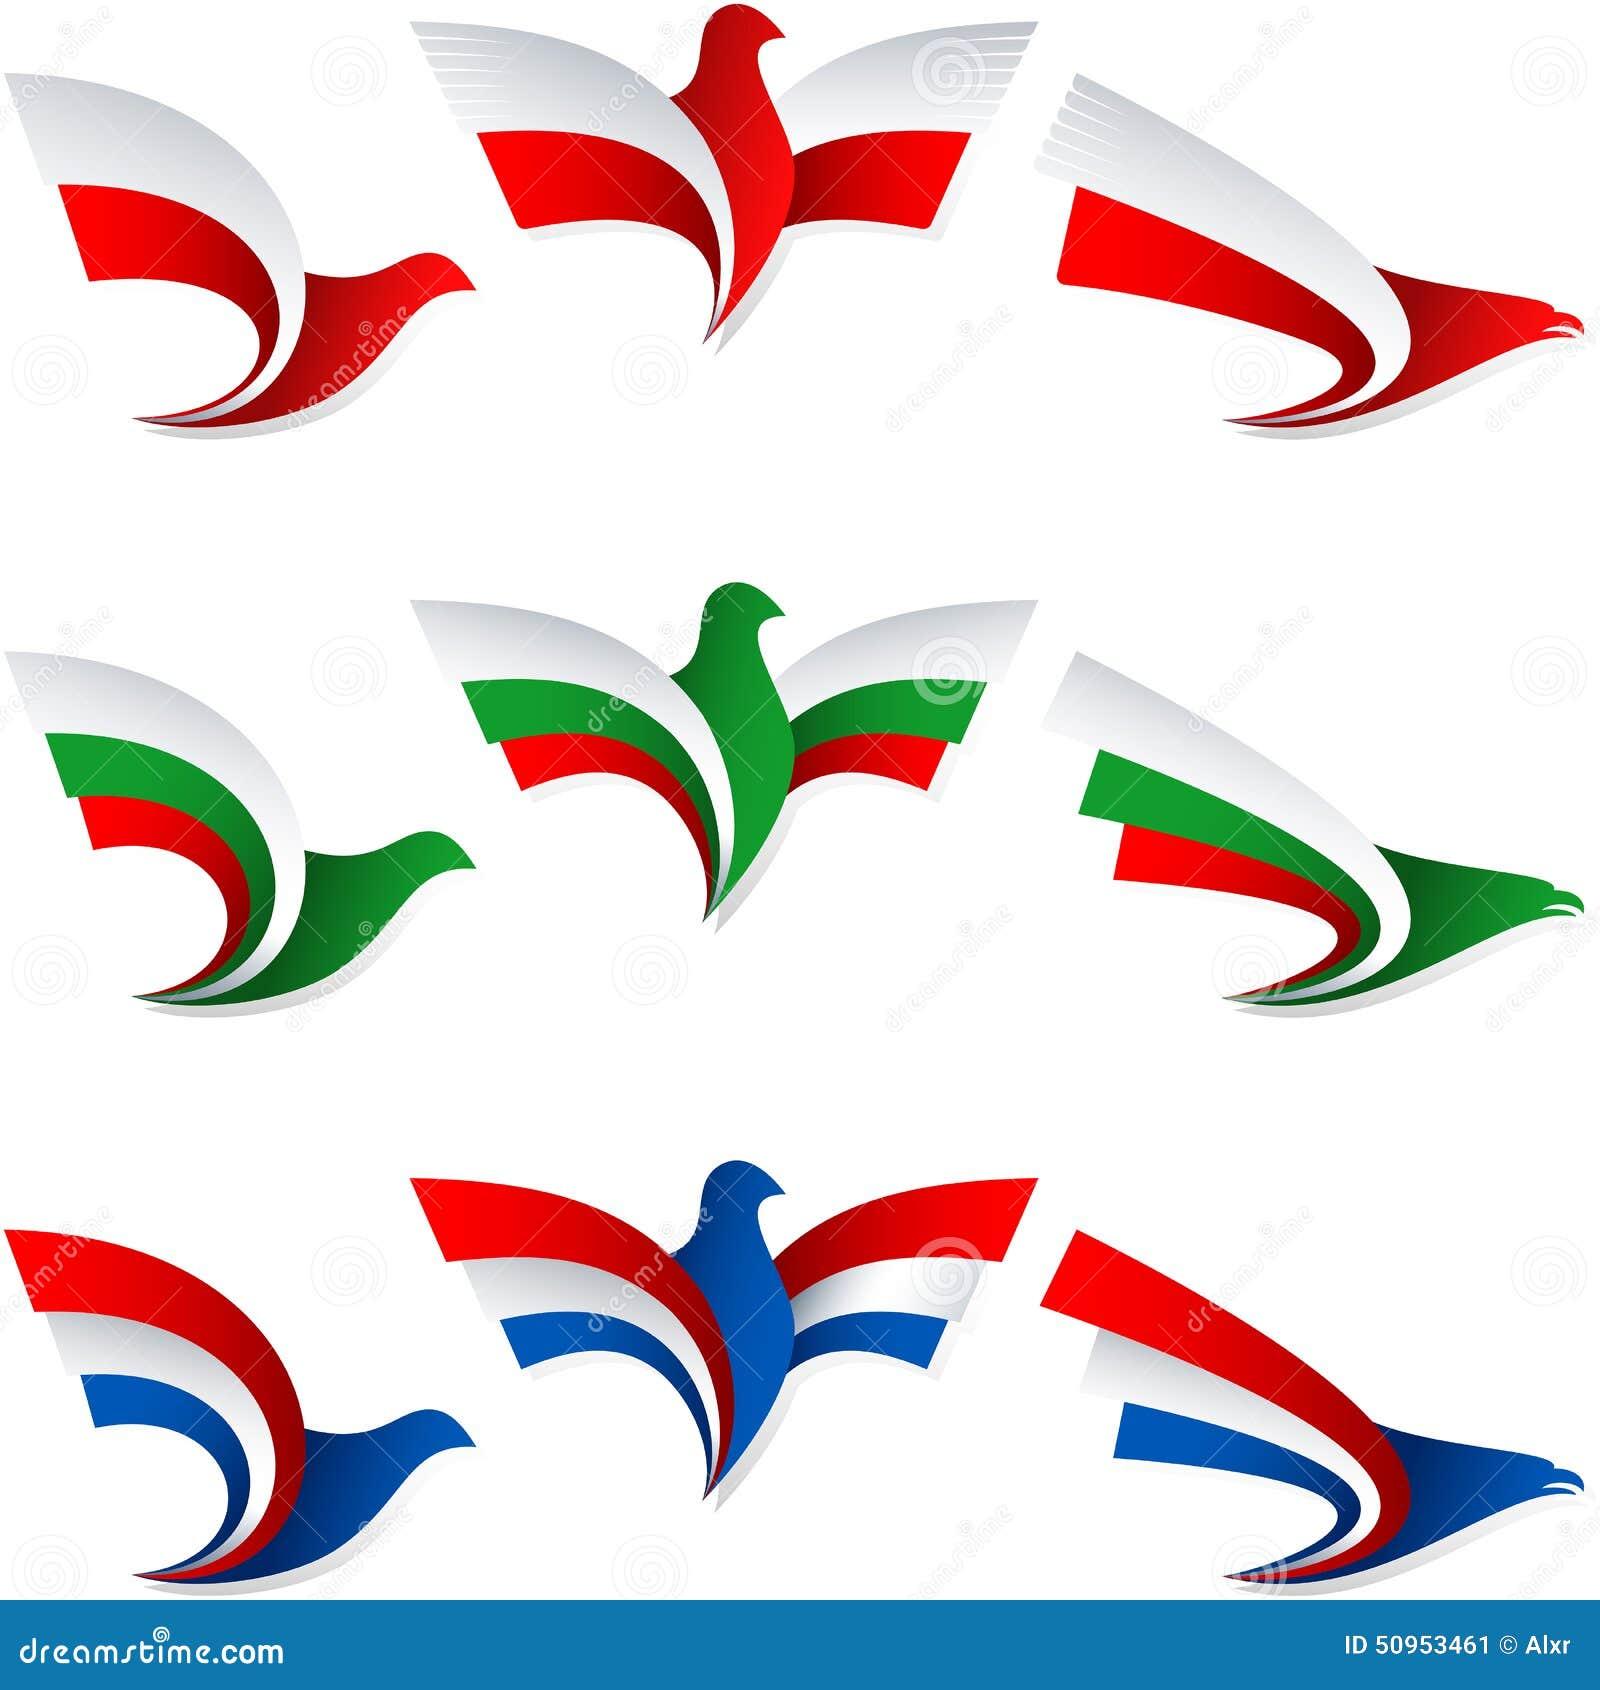 Ptasie komarnicy flaga znaka symbolu insygni Polska Bułgaria holandie